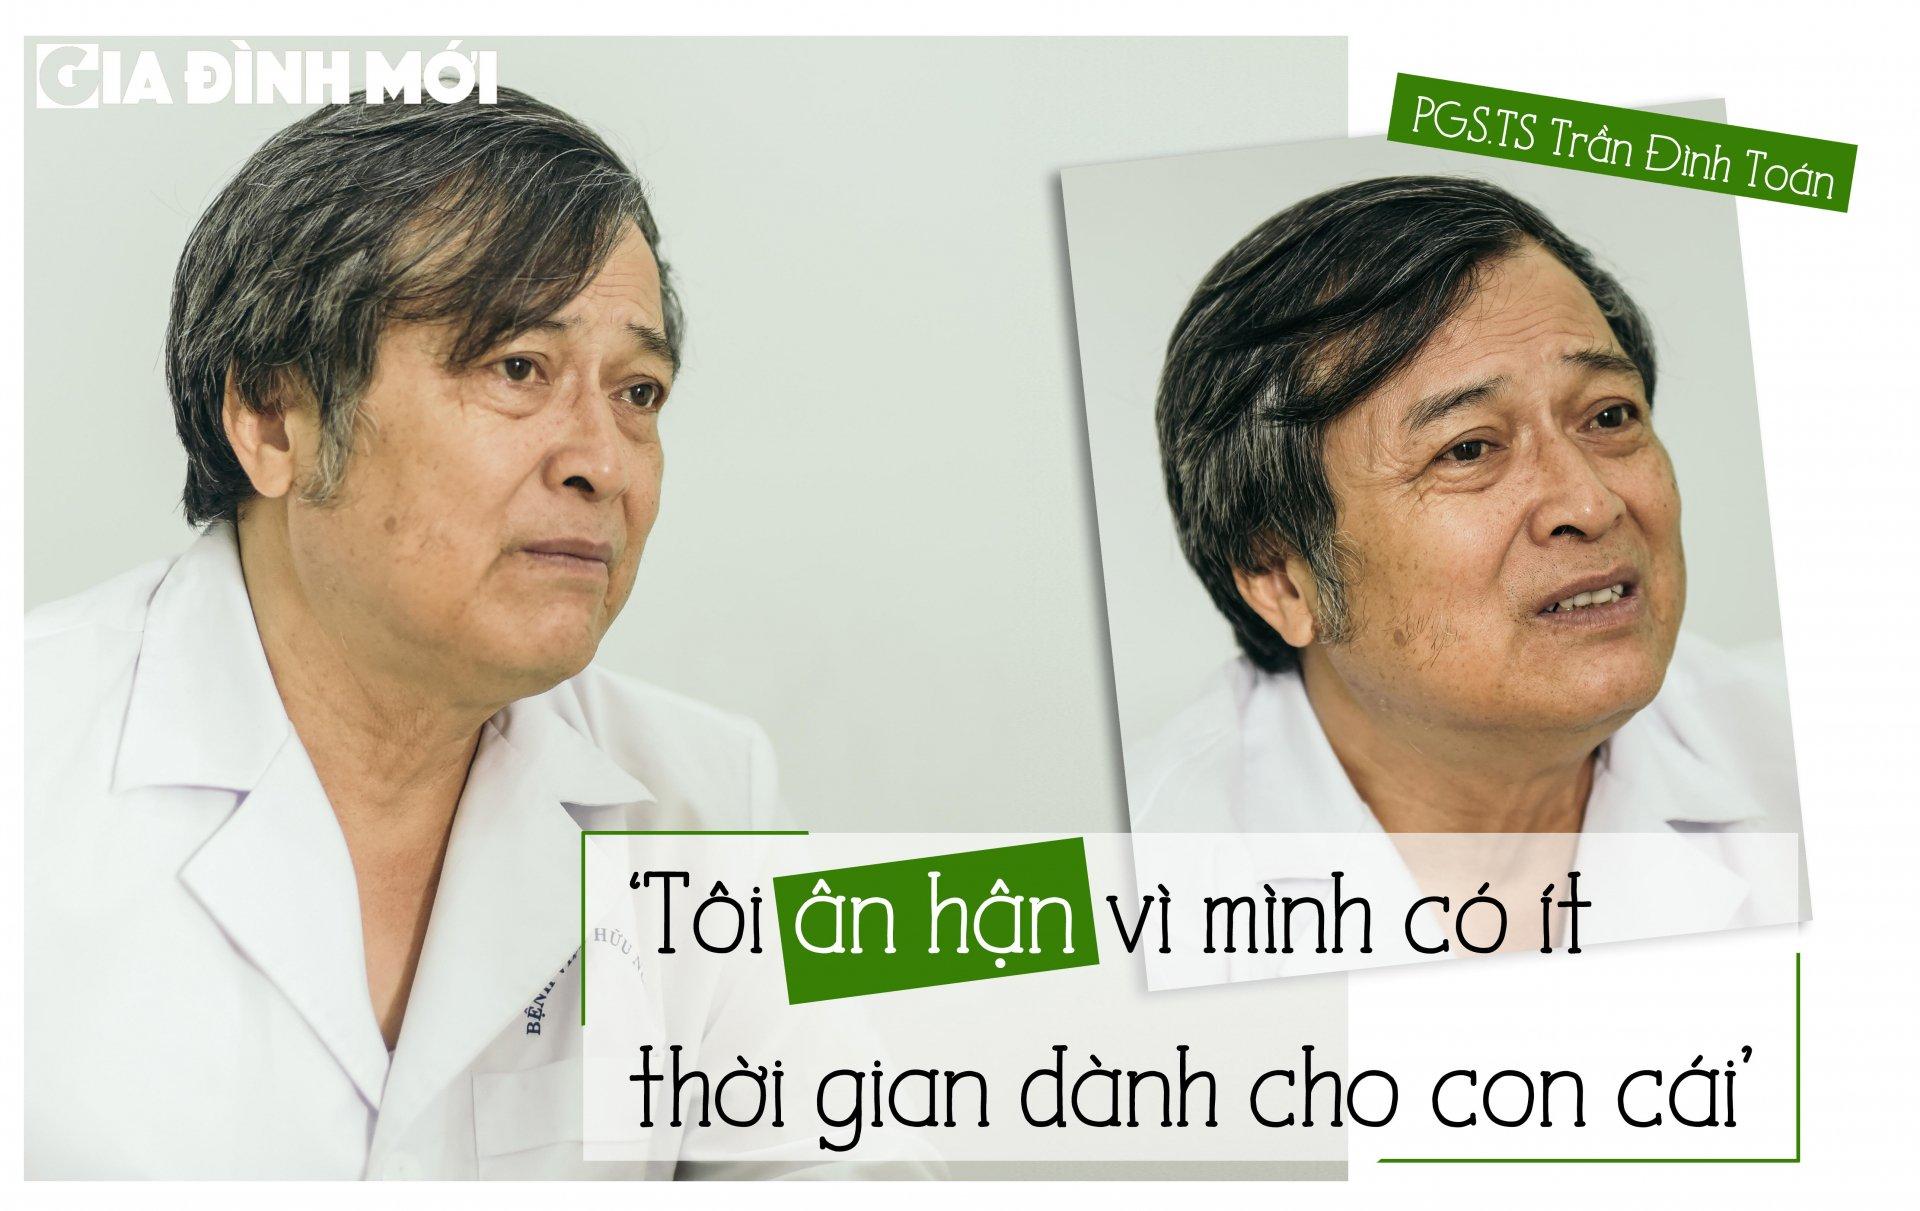 Nguyen Truong khoa Dinh duong benh vien Huu Nghi: 'Toi thich di cho va say sua voi cong viec do' hinh anh 6